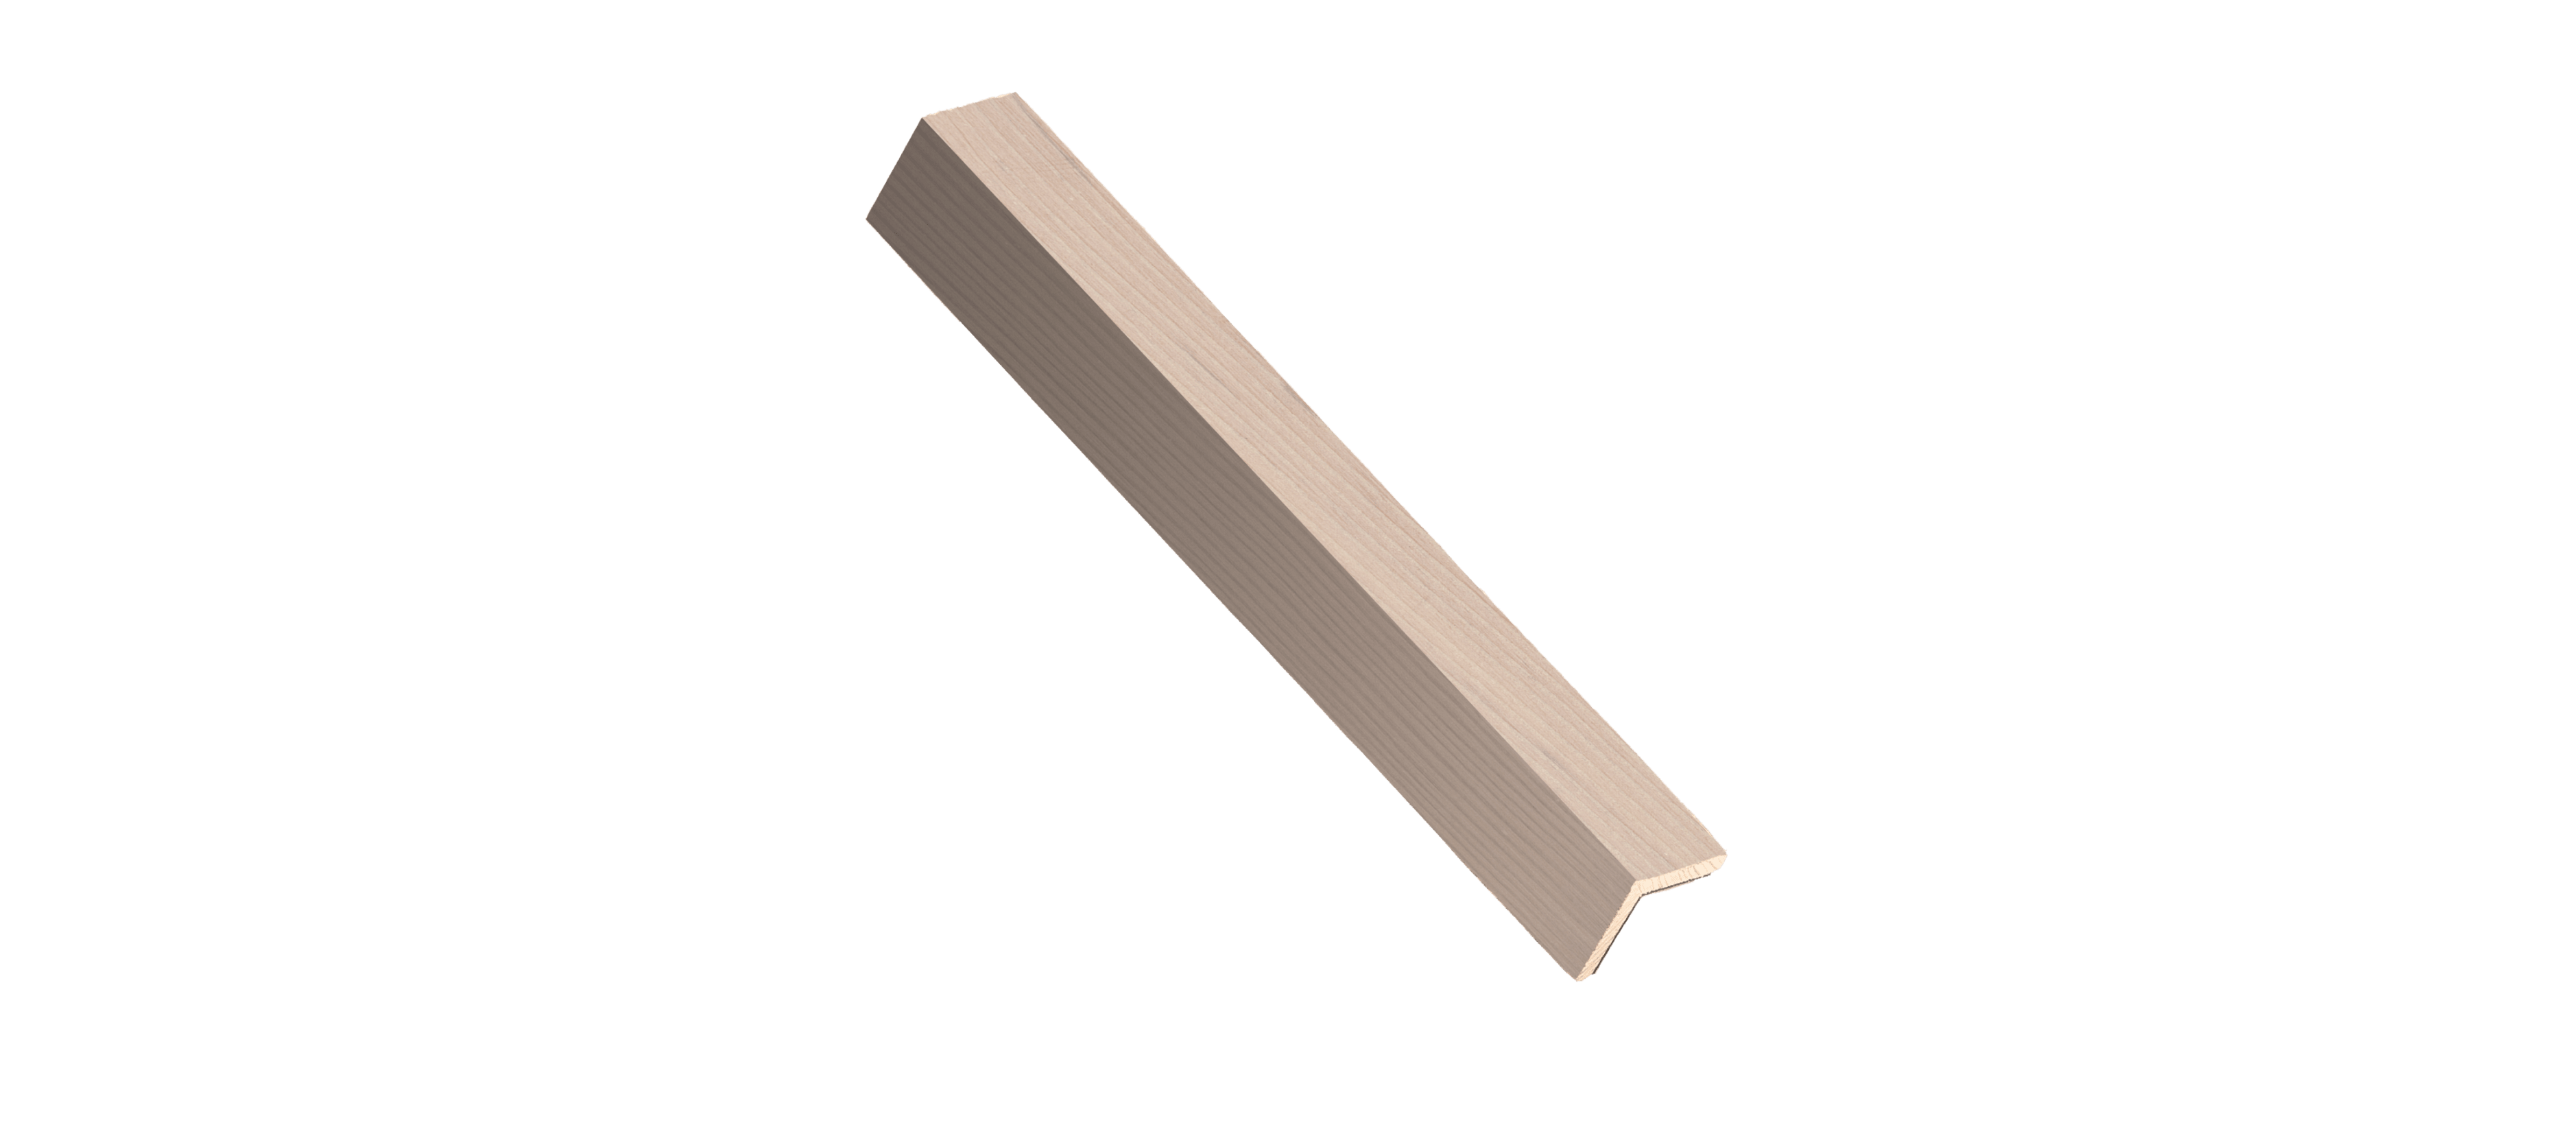 Minimalist Fir Wood Corner Trim Sample